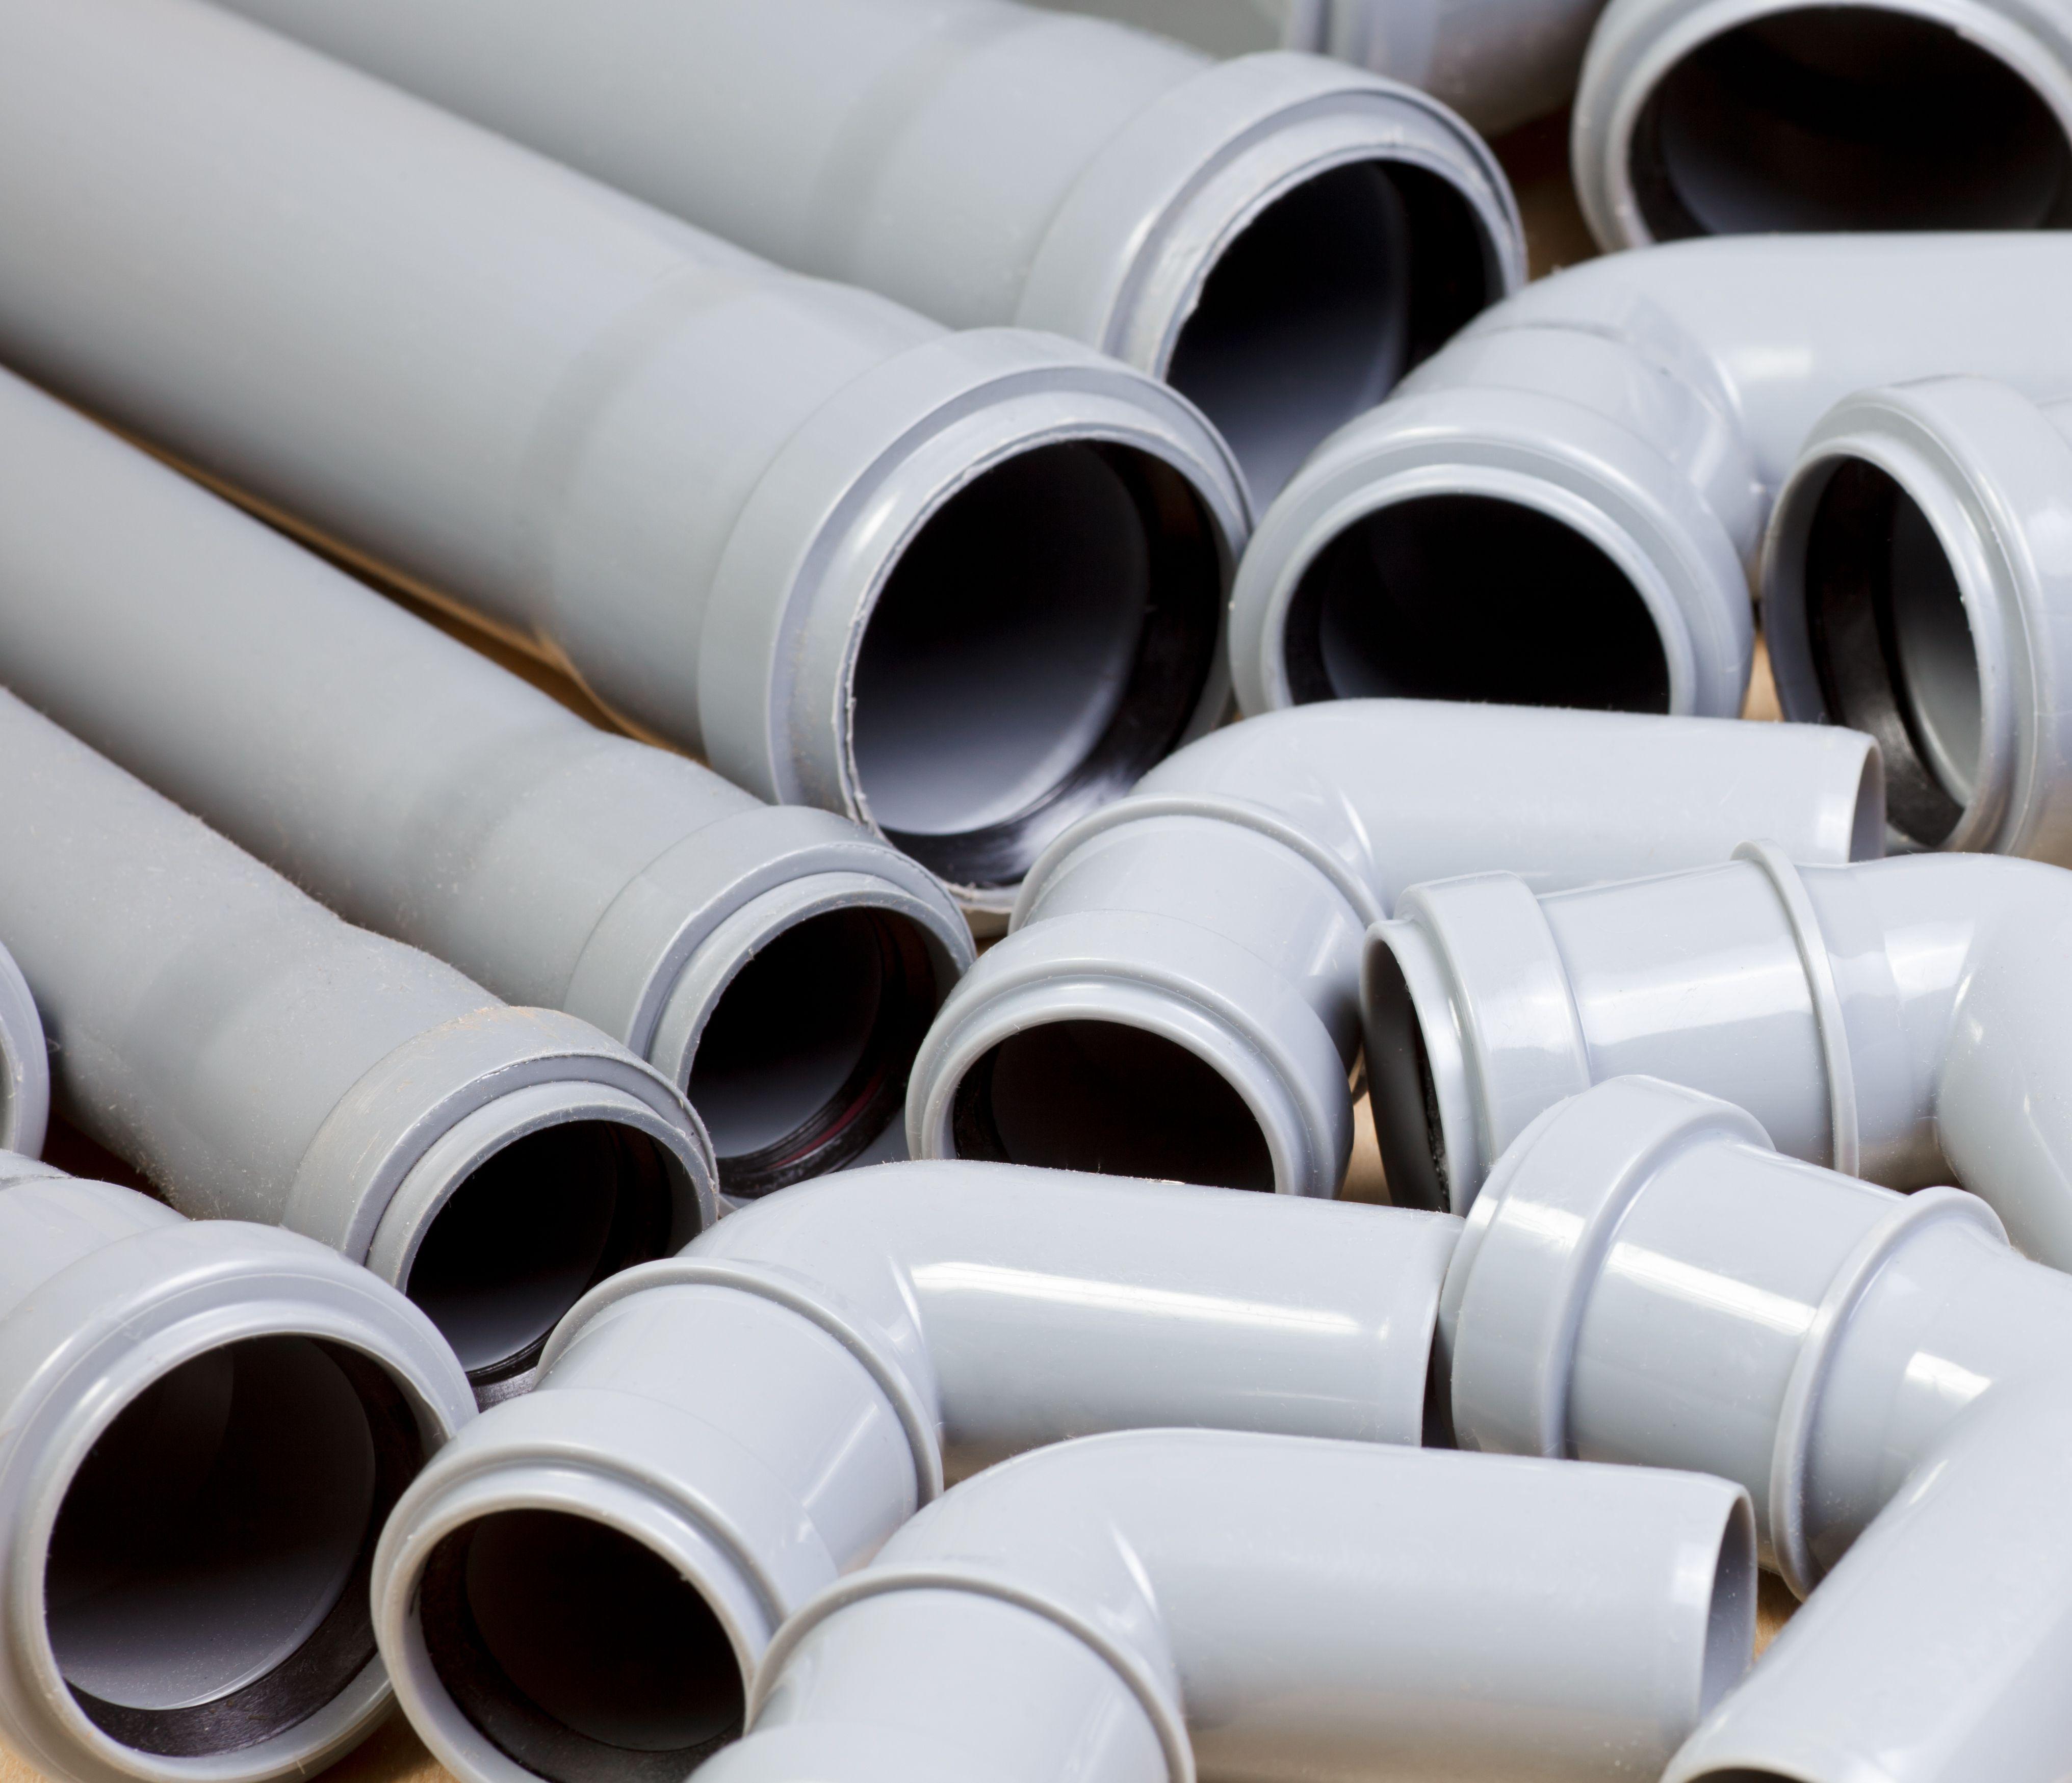 Instalación de tuberías: Servicios de Joman